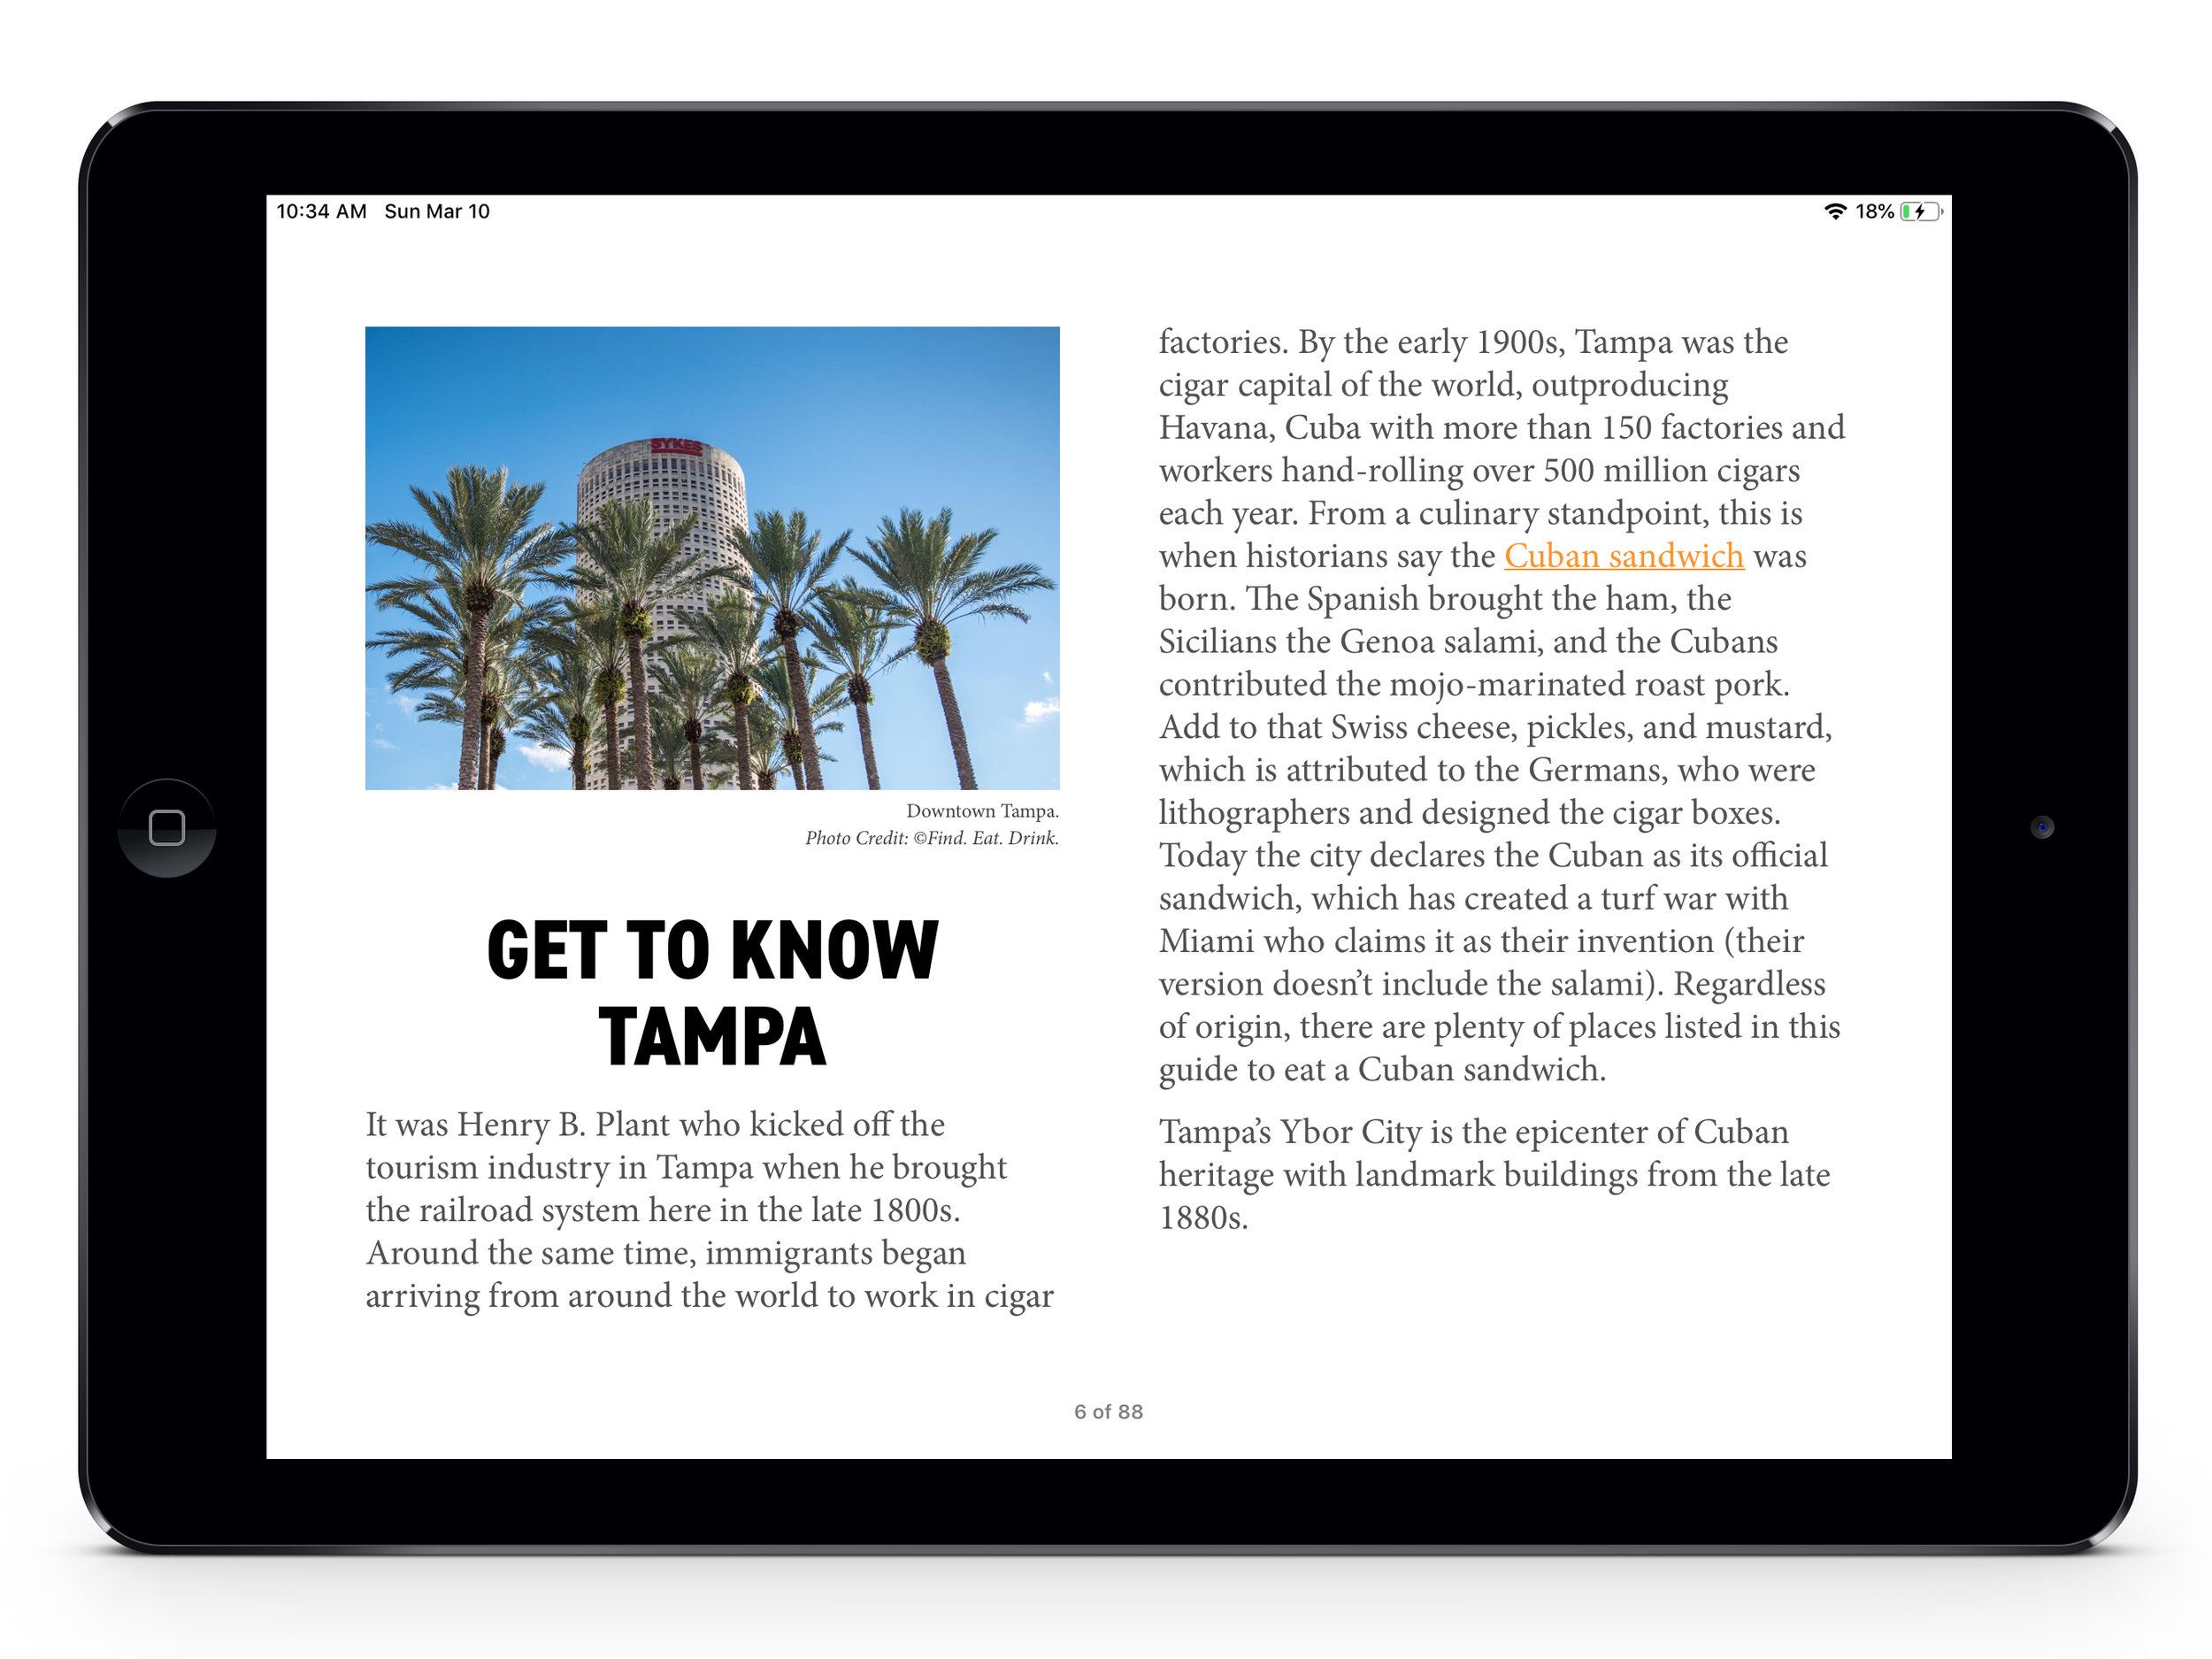 iPadAir_Tampa_Screenshots_Landscape_1.3.jpg